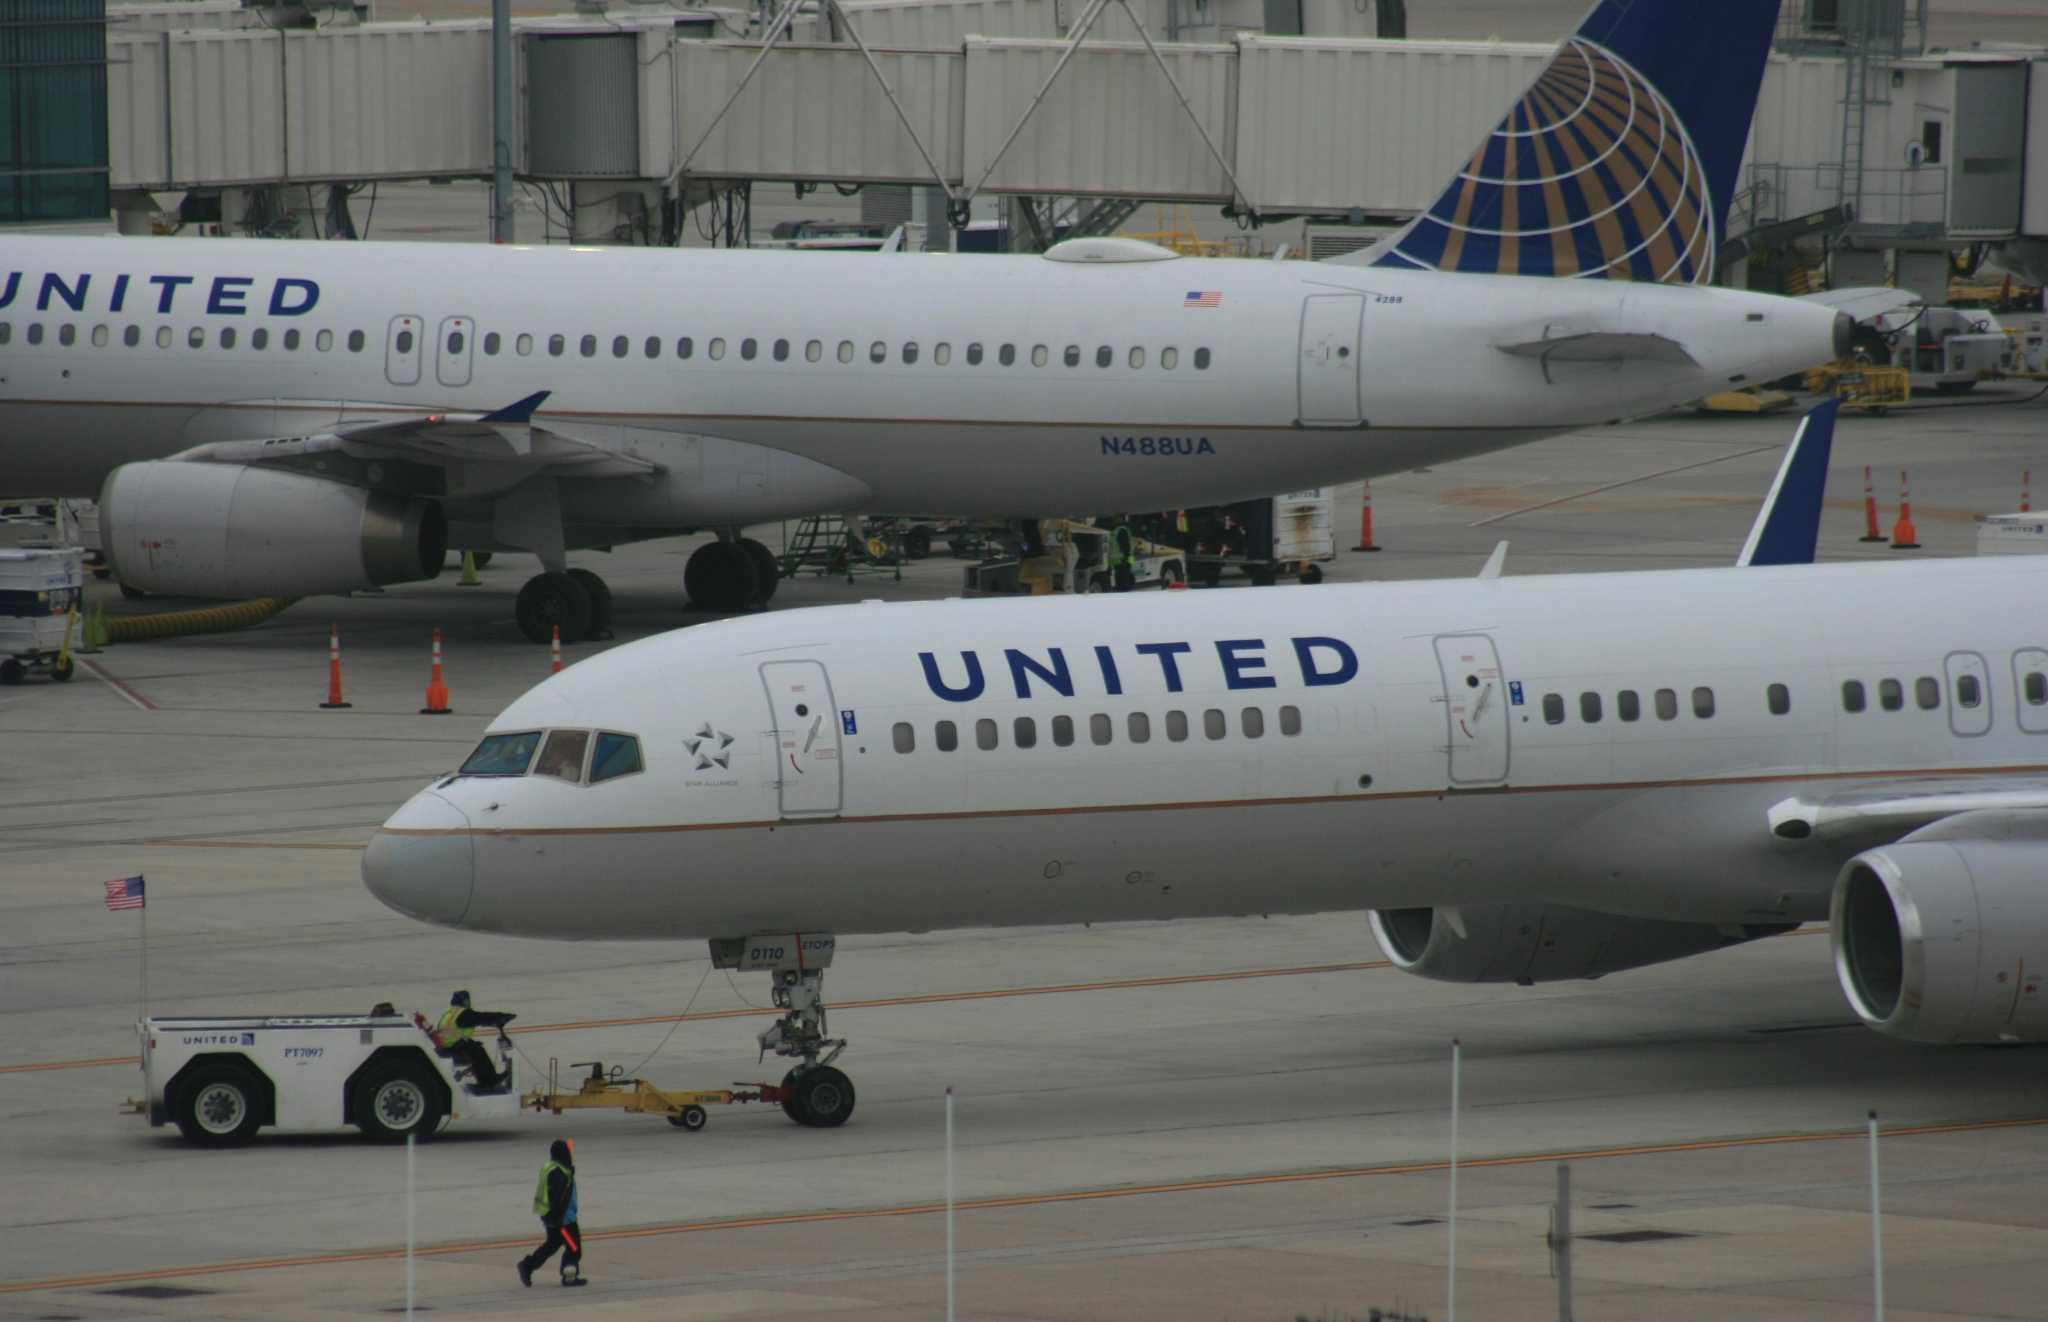 Teen jumps from Houston-to-Oklahoma City flight's jet bridge to avoid arrest, police say